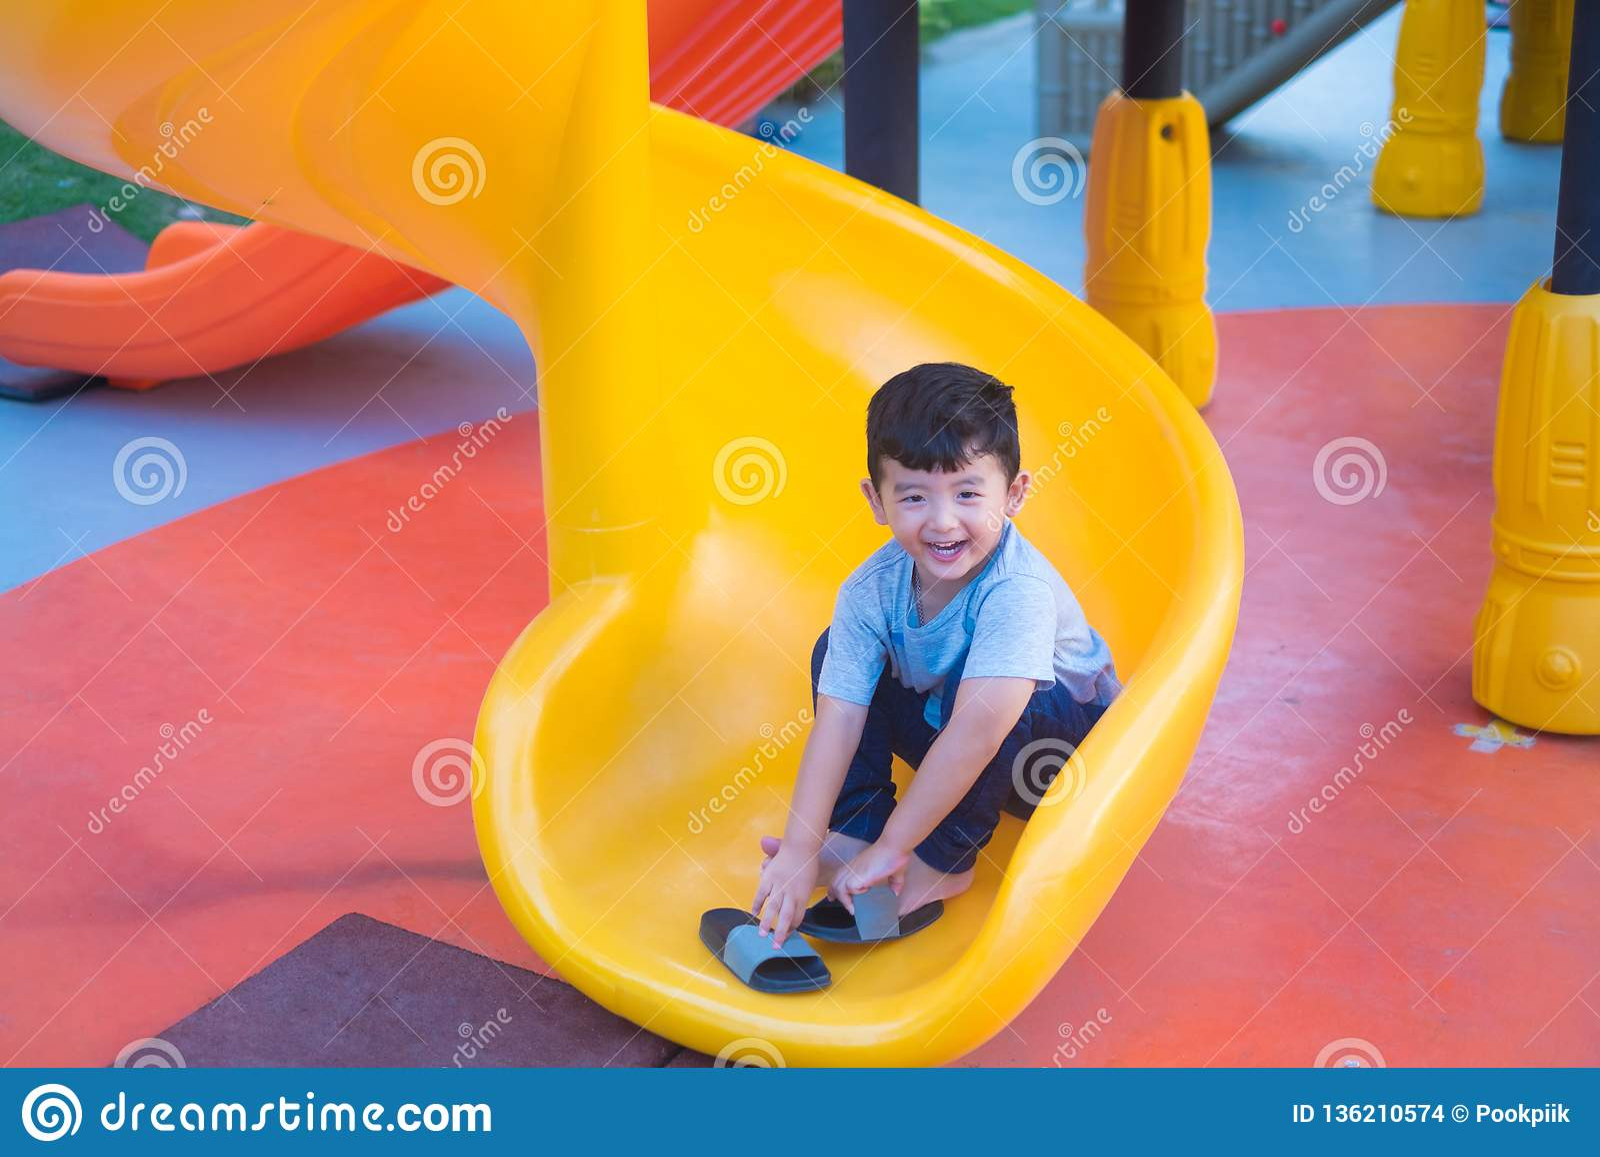 Asian kid playing slide at the playground under the sunlight in summer, Happy kid in kindergarten or preschool school yard